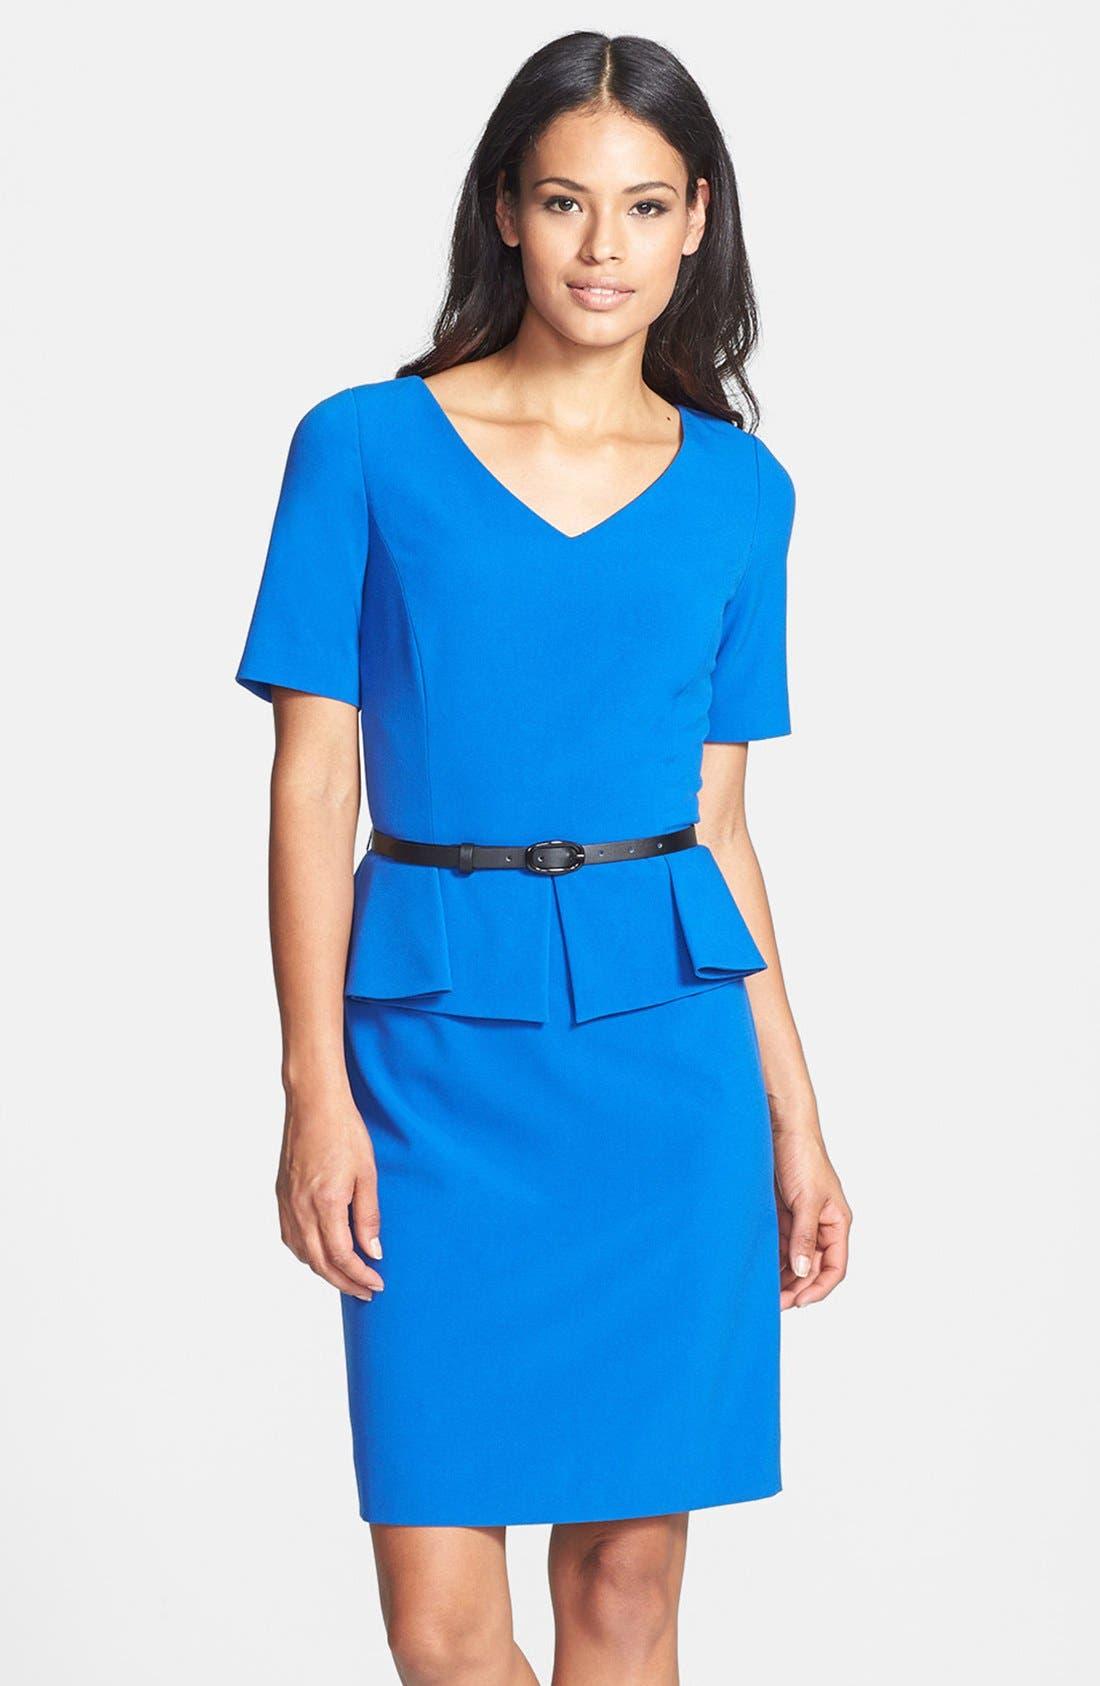 Alternate Image 1 Selected - Tahari Stretch Peplum Sheath Dress